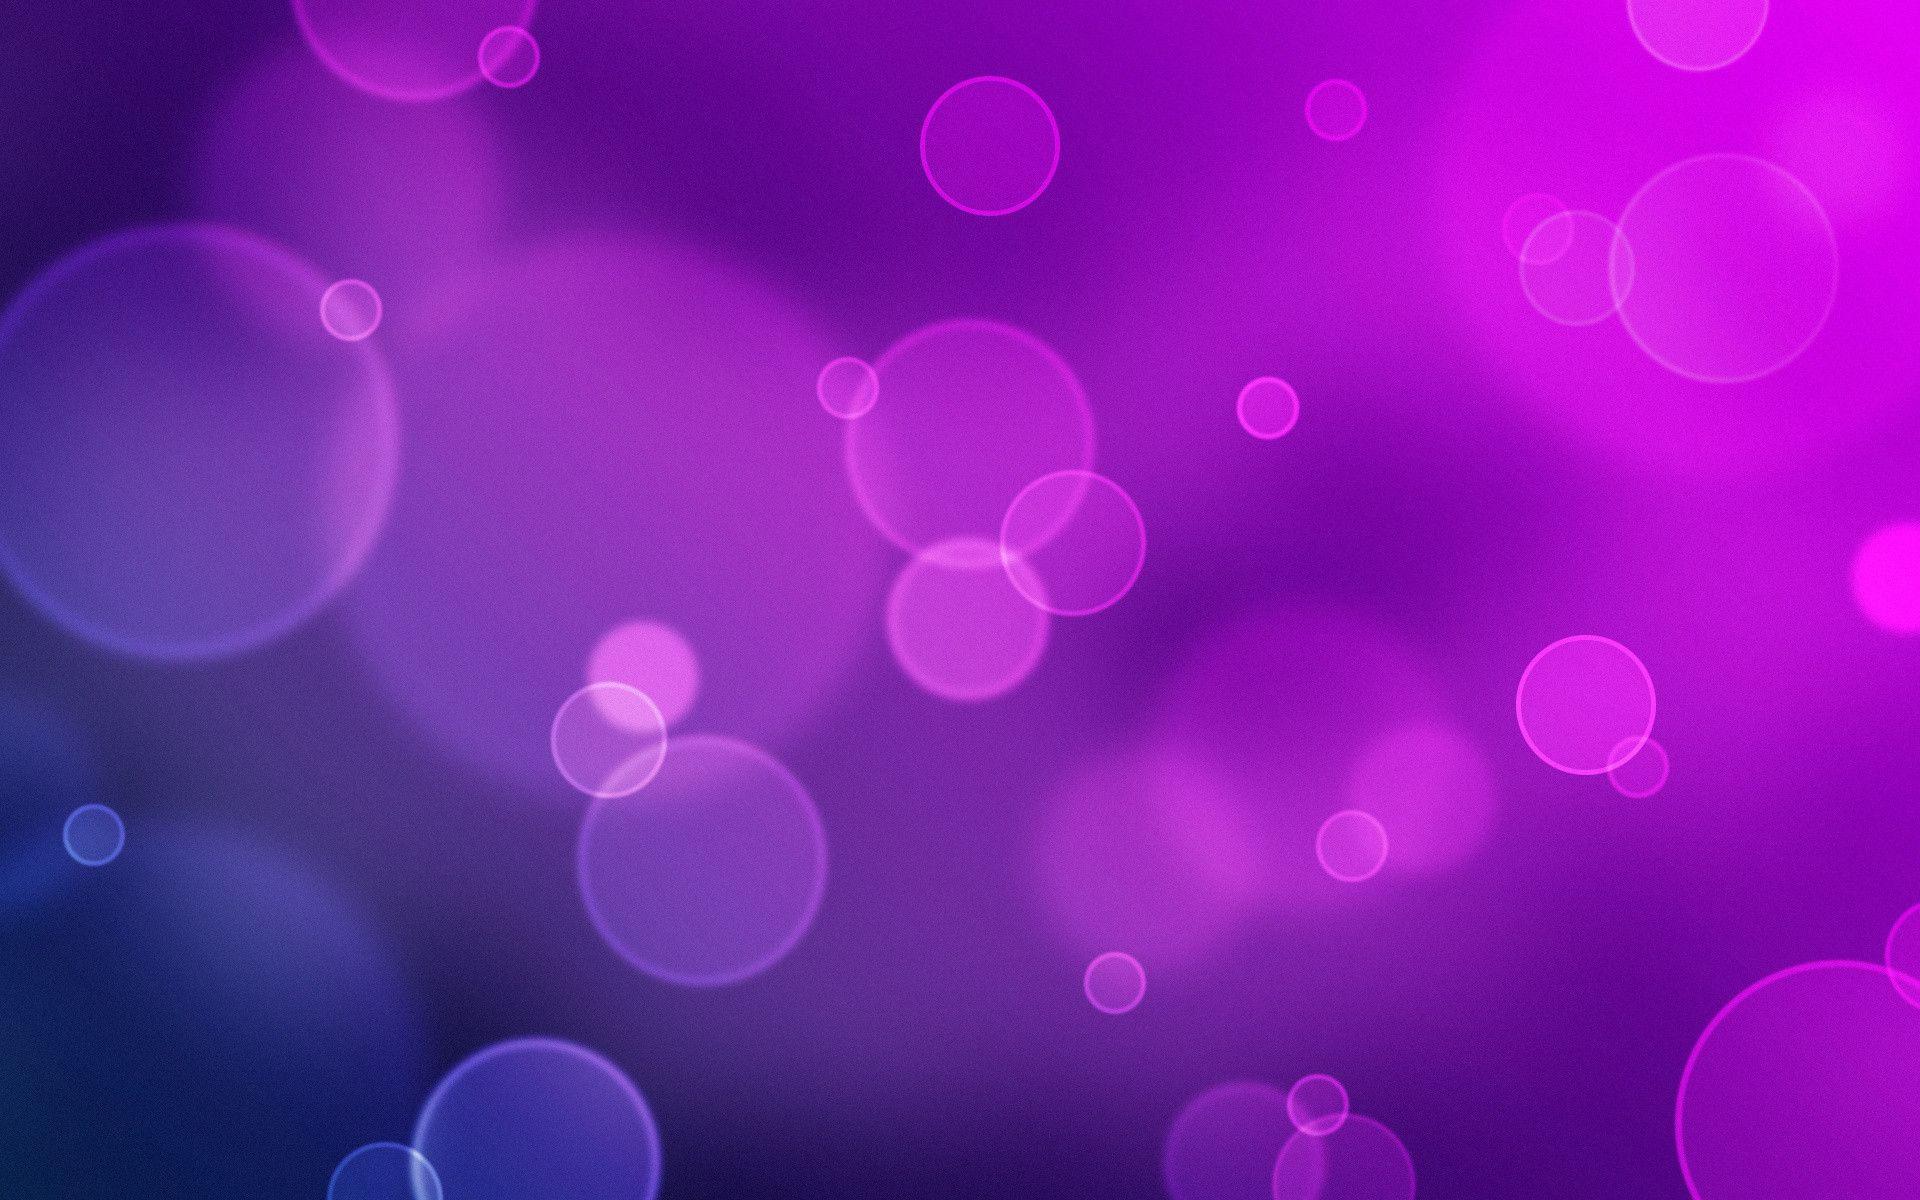 Purple Backgrounds HD 1920x1200